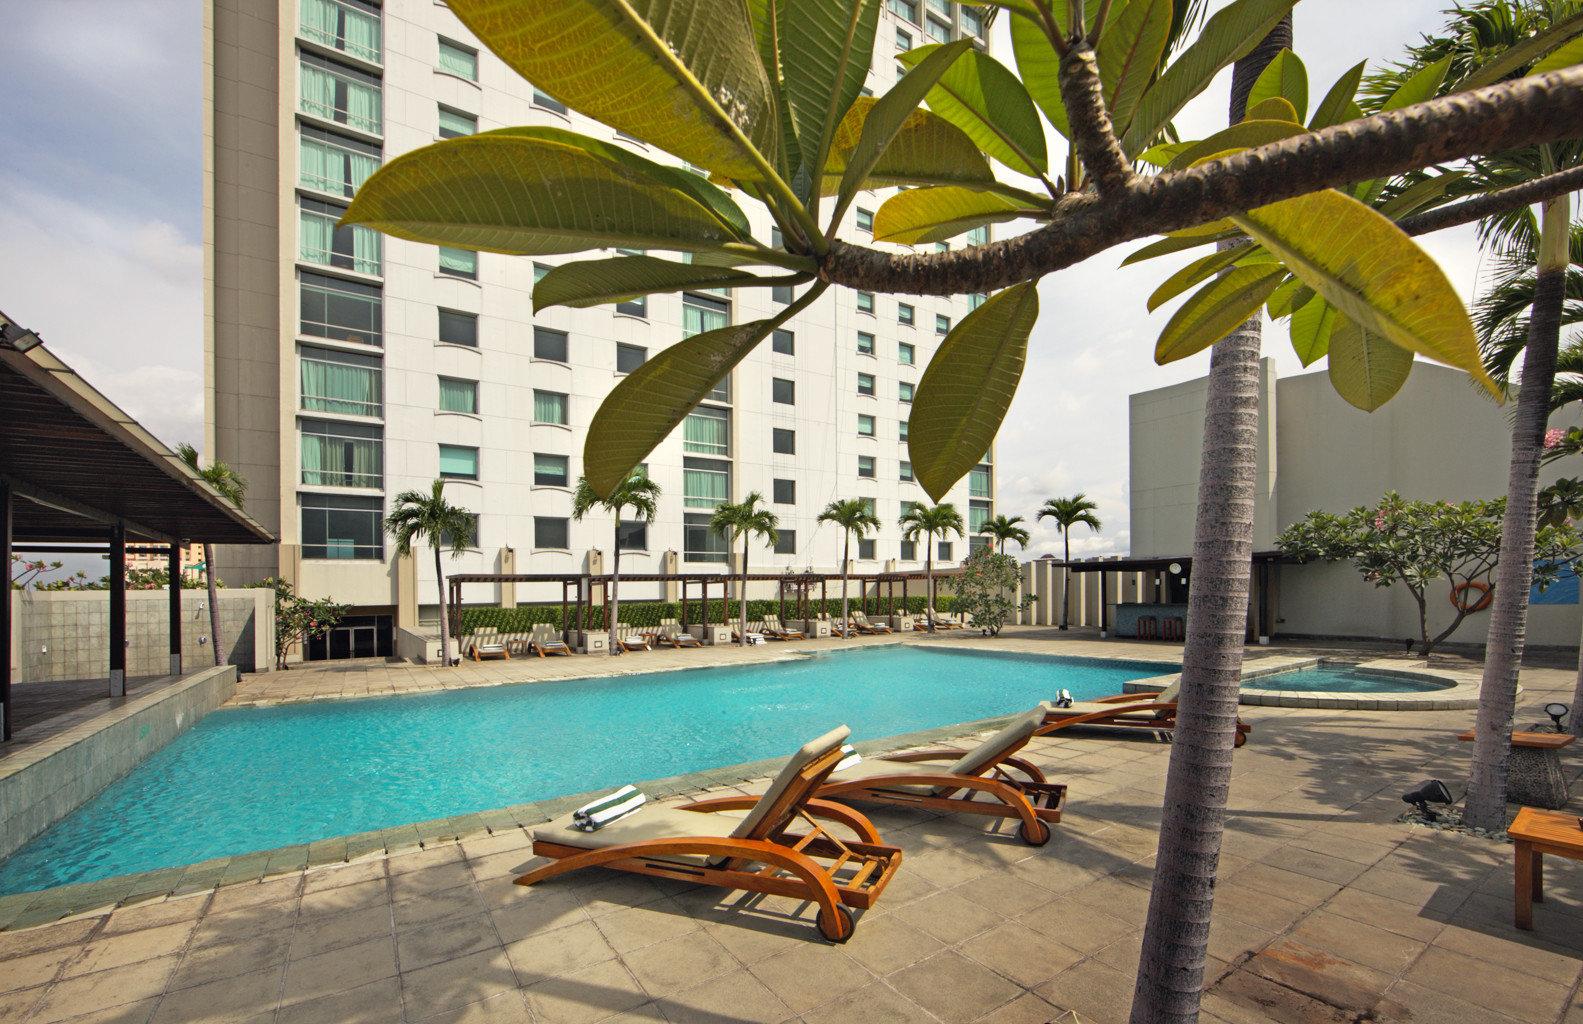 Exterior Lounge Luxury Pool ground leisure swimming pool property Resort condominium building Villa caribbean hacienda arecales mansion